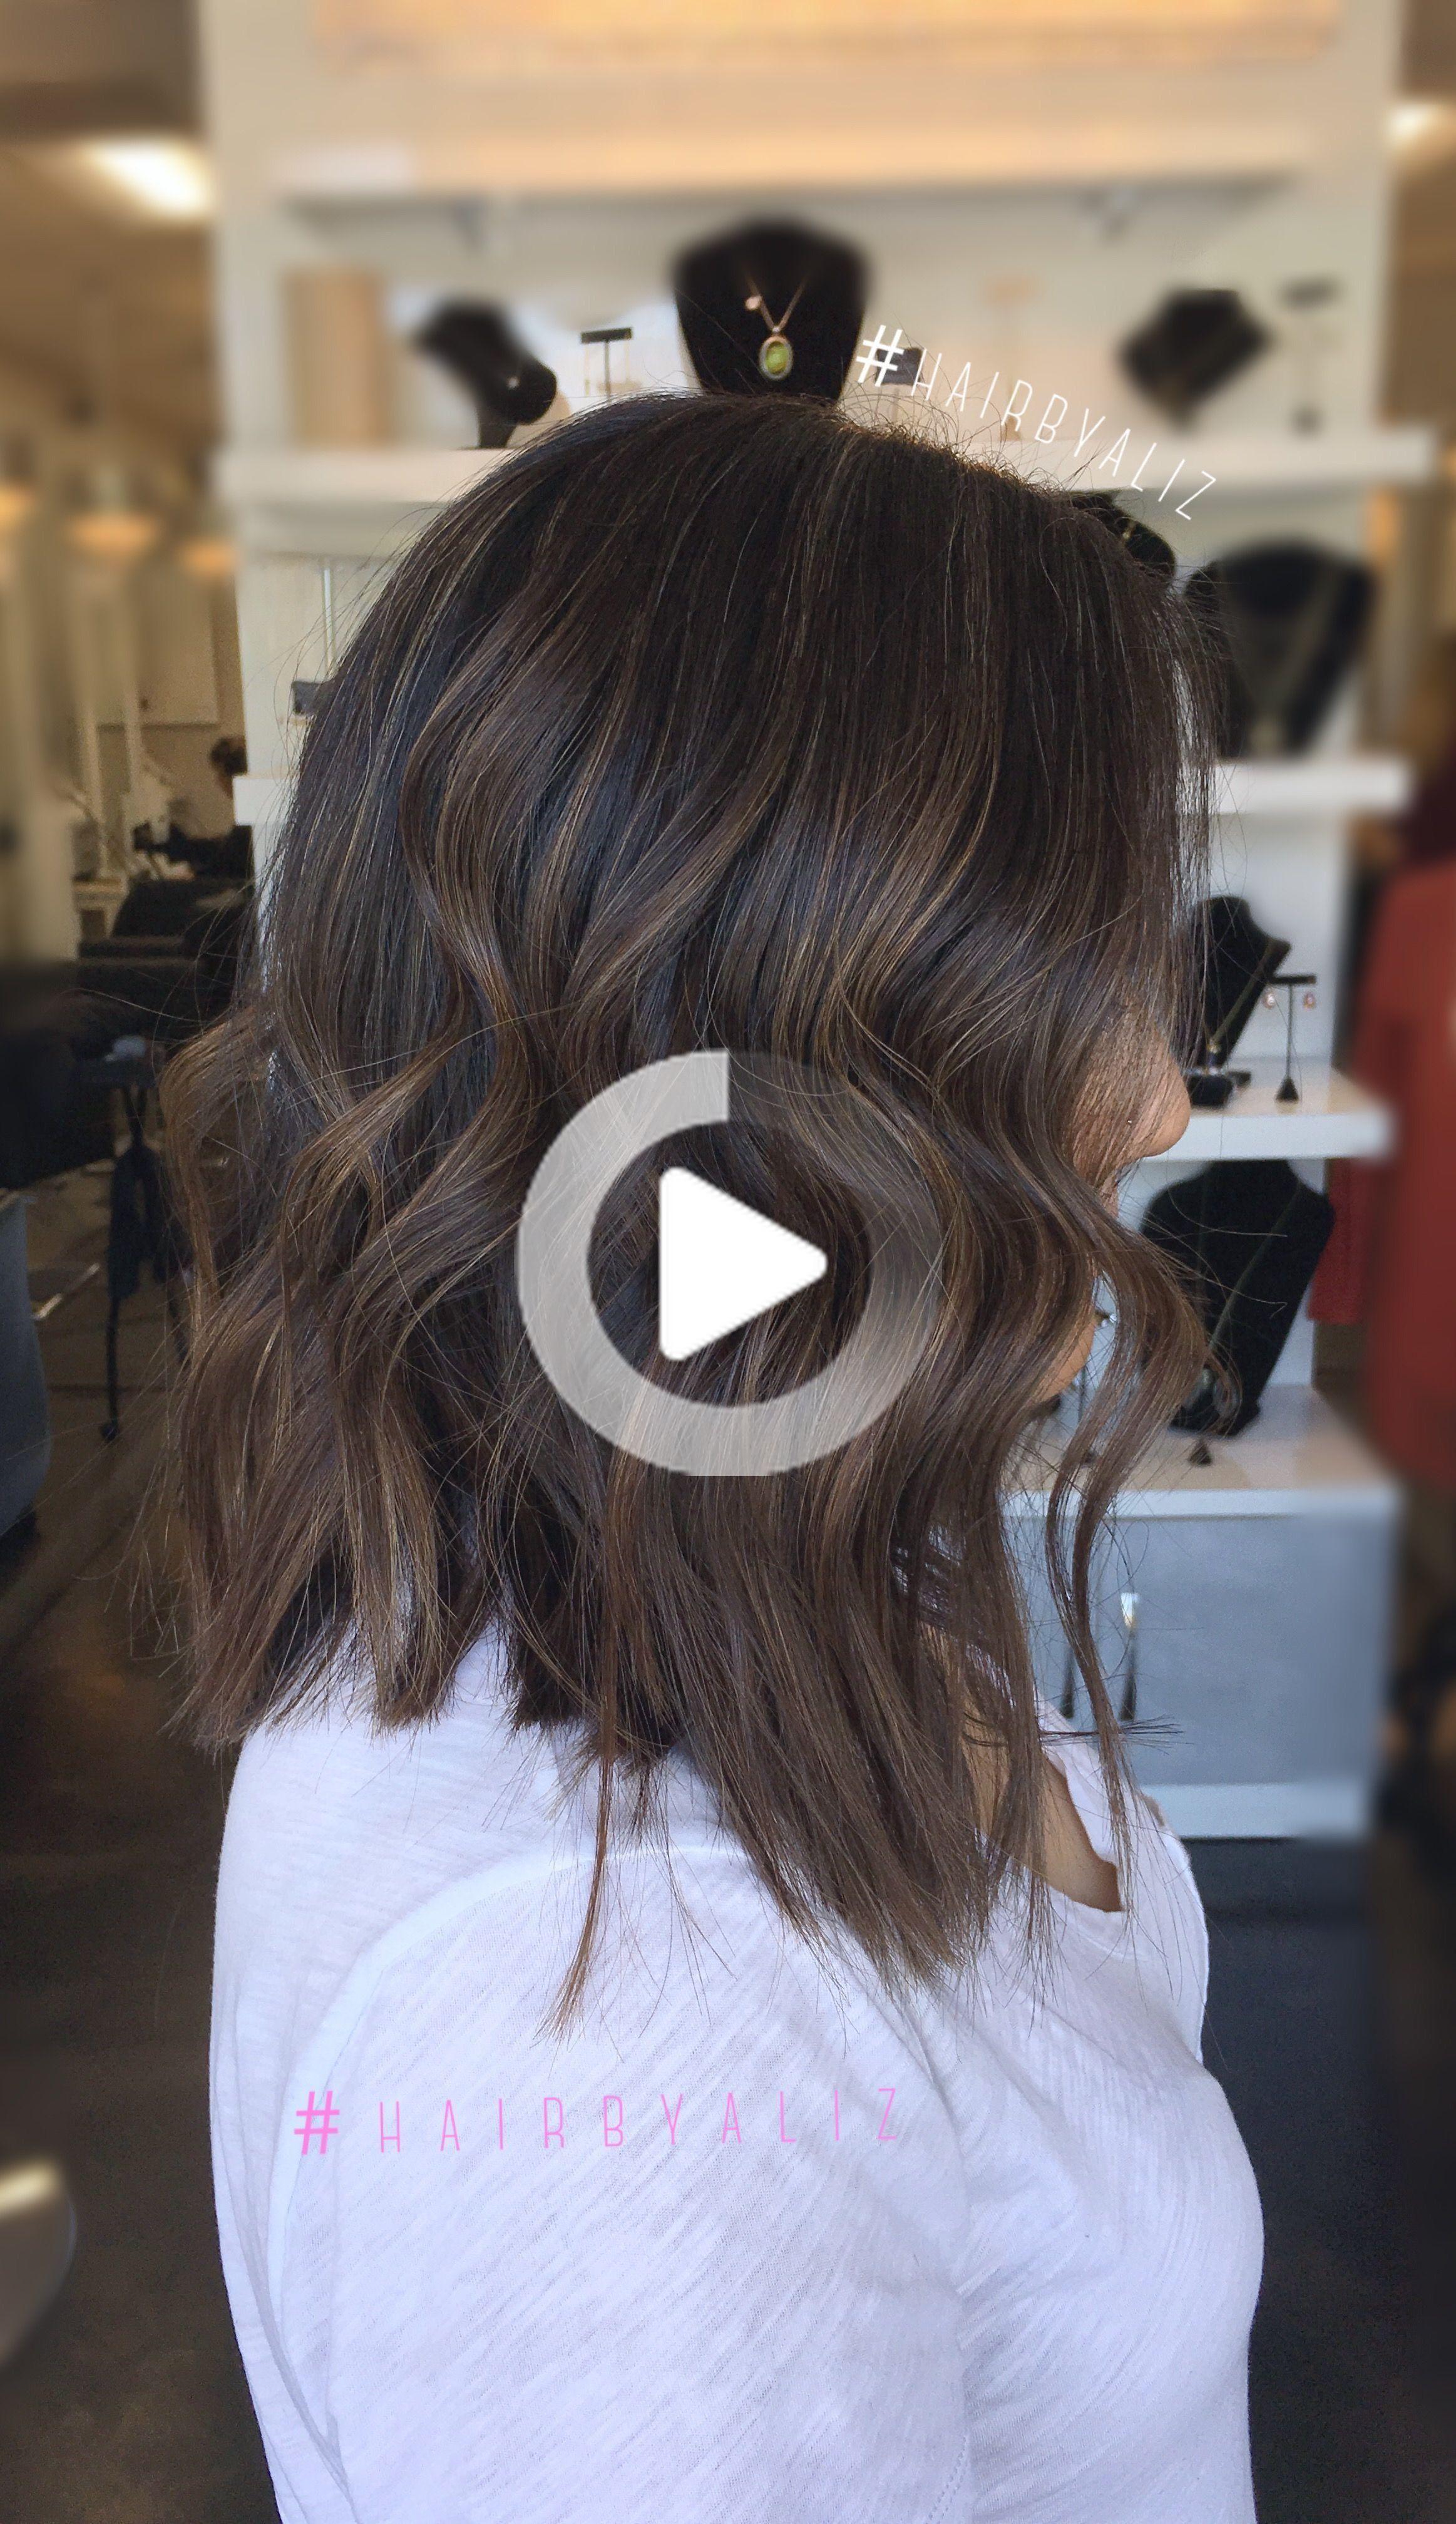 Hairstyle Ideas Teenage Girl Hairstyle Ideas With Bangs Hairstyle Ideas With Braiding Hair In 2020 Cute Simple Hairstyles Braided Hairstyles Hair Styles